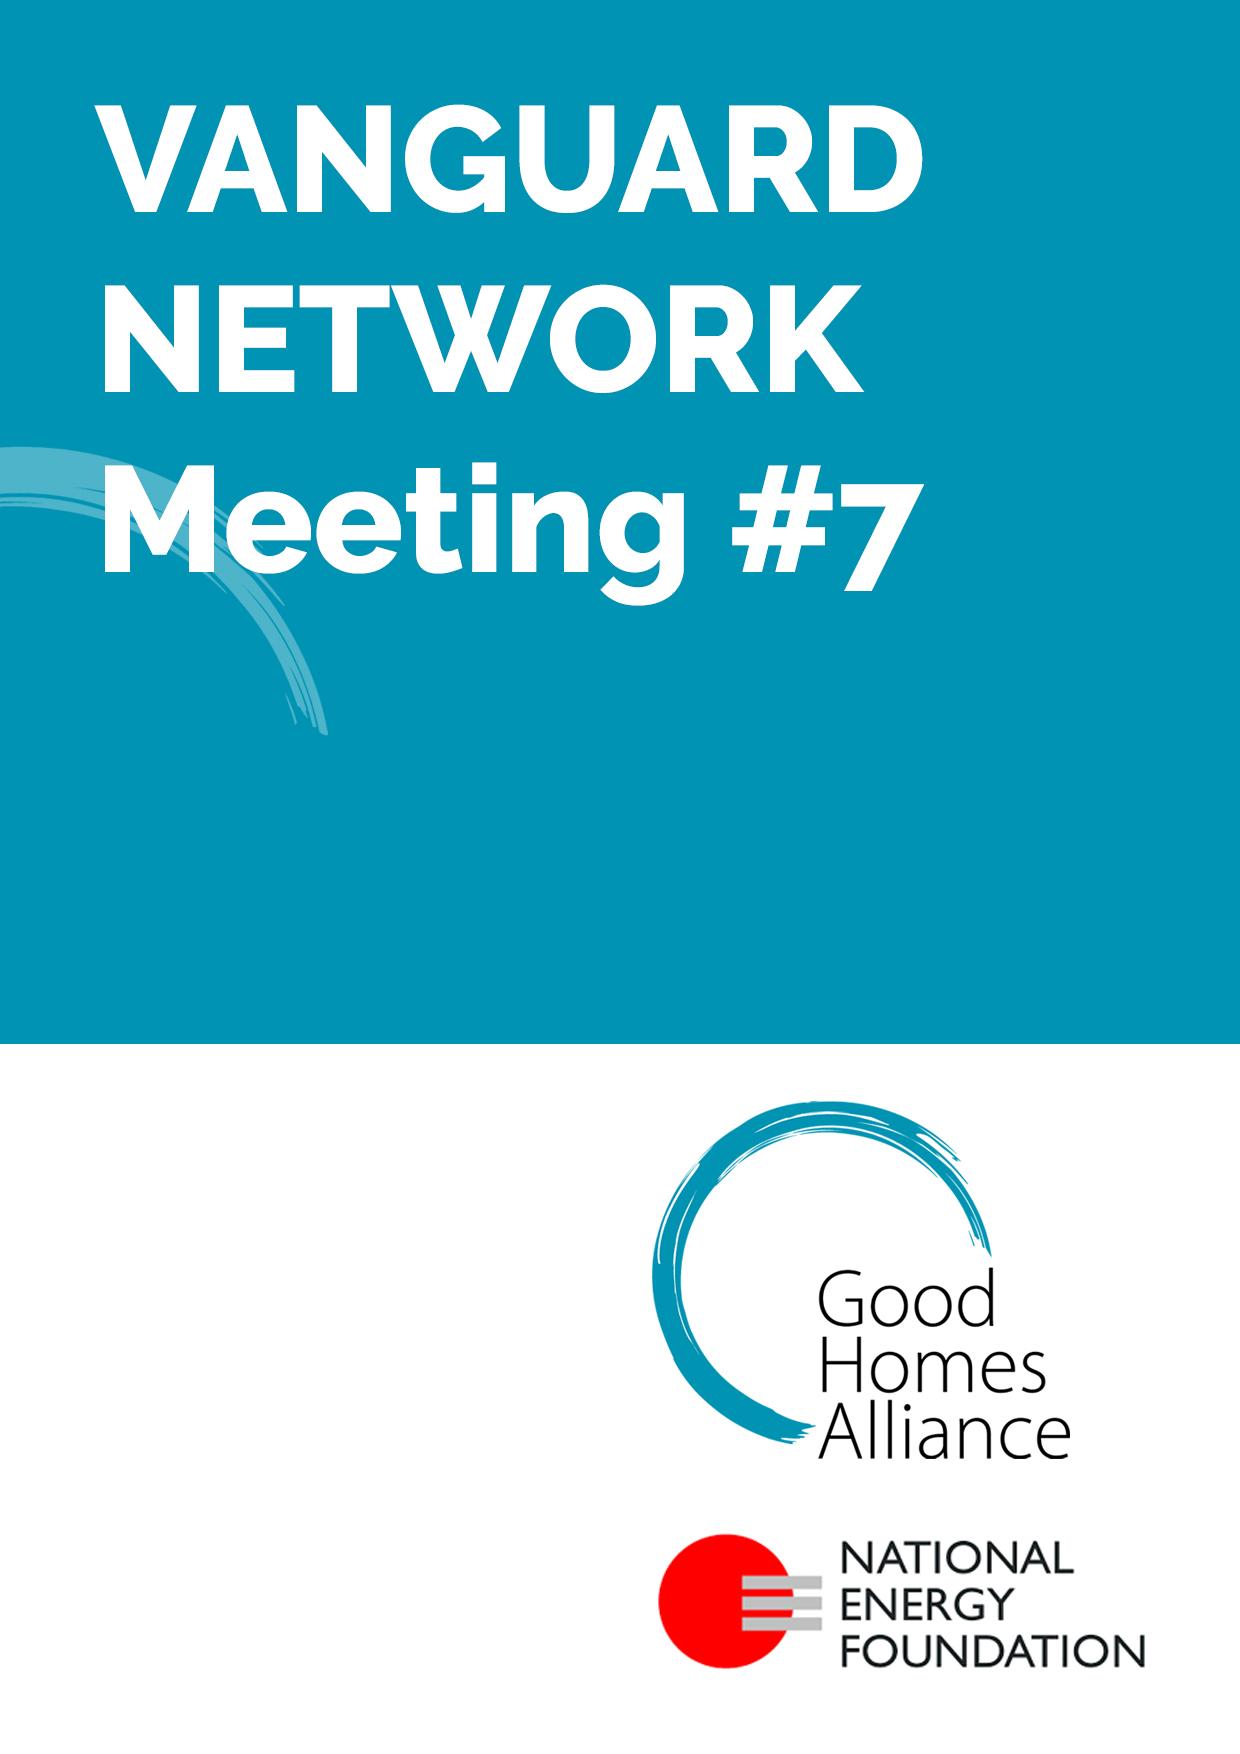 Vanguard Network meeting #7